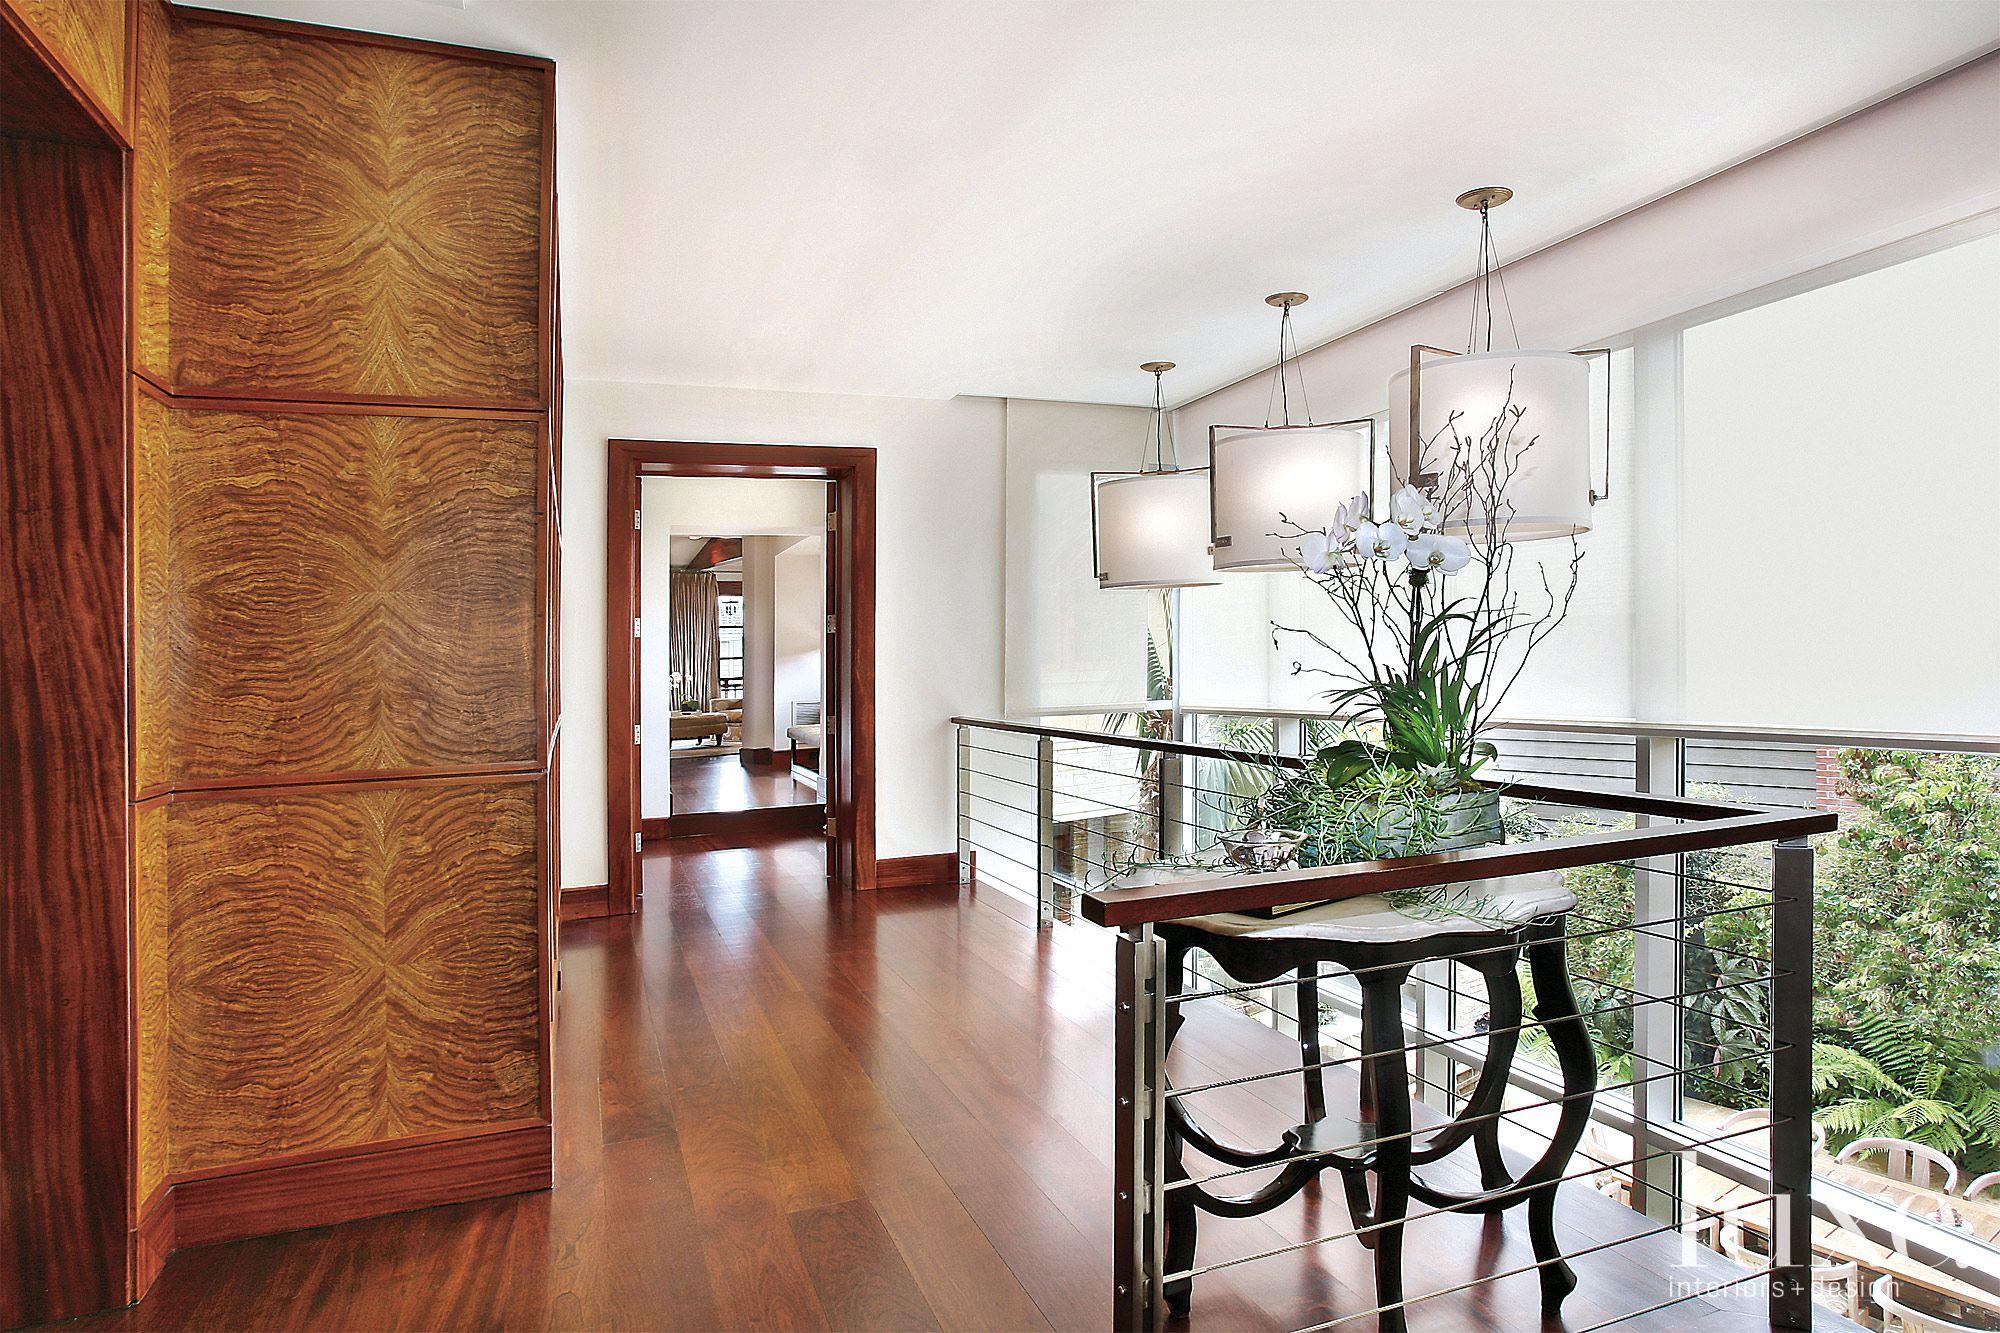 Contemporary White Hallway with Mahogany Paneling